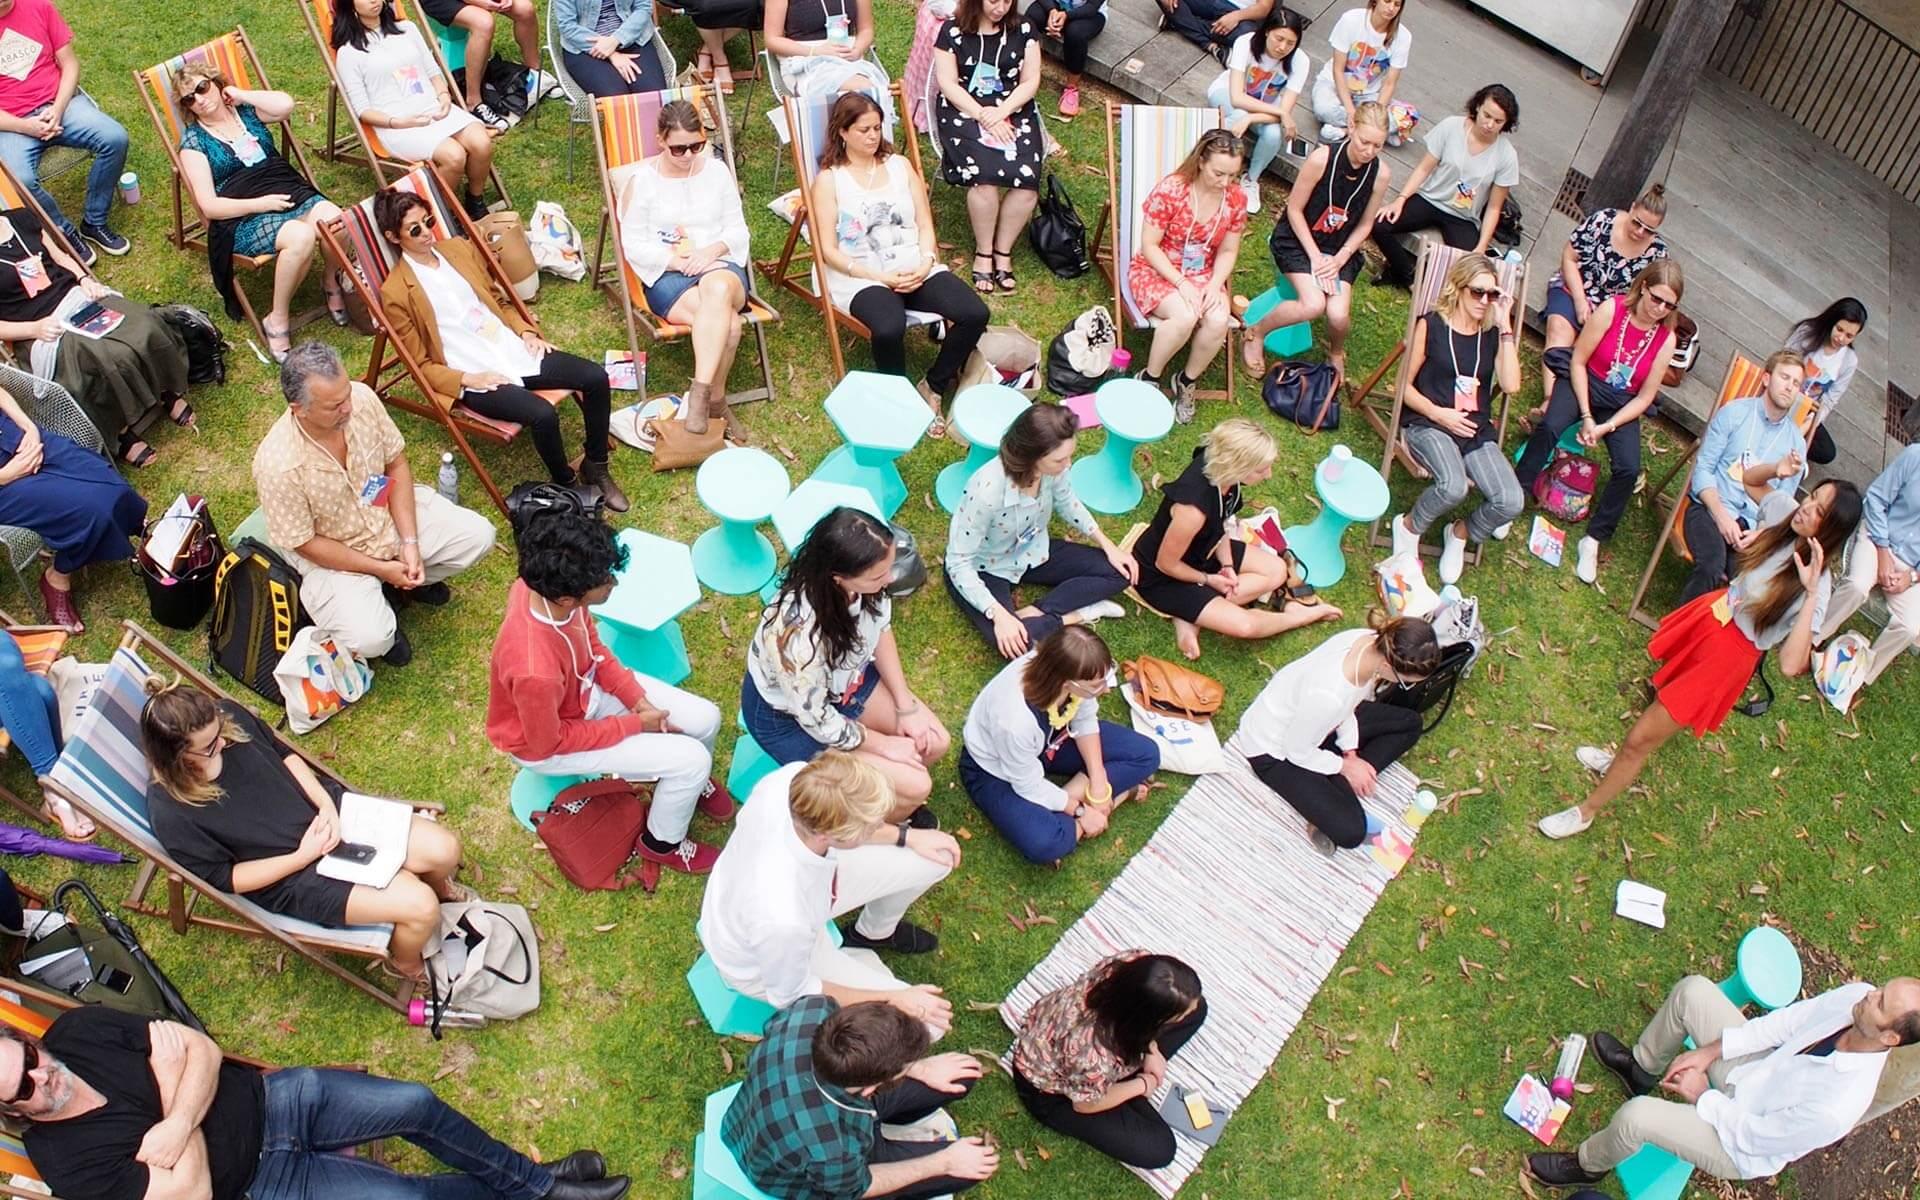 Purpose 2016 yoga and meditation outdoors